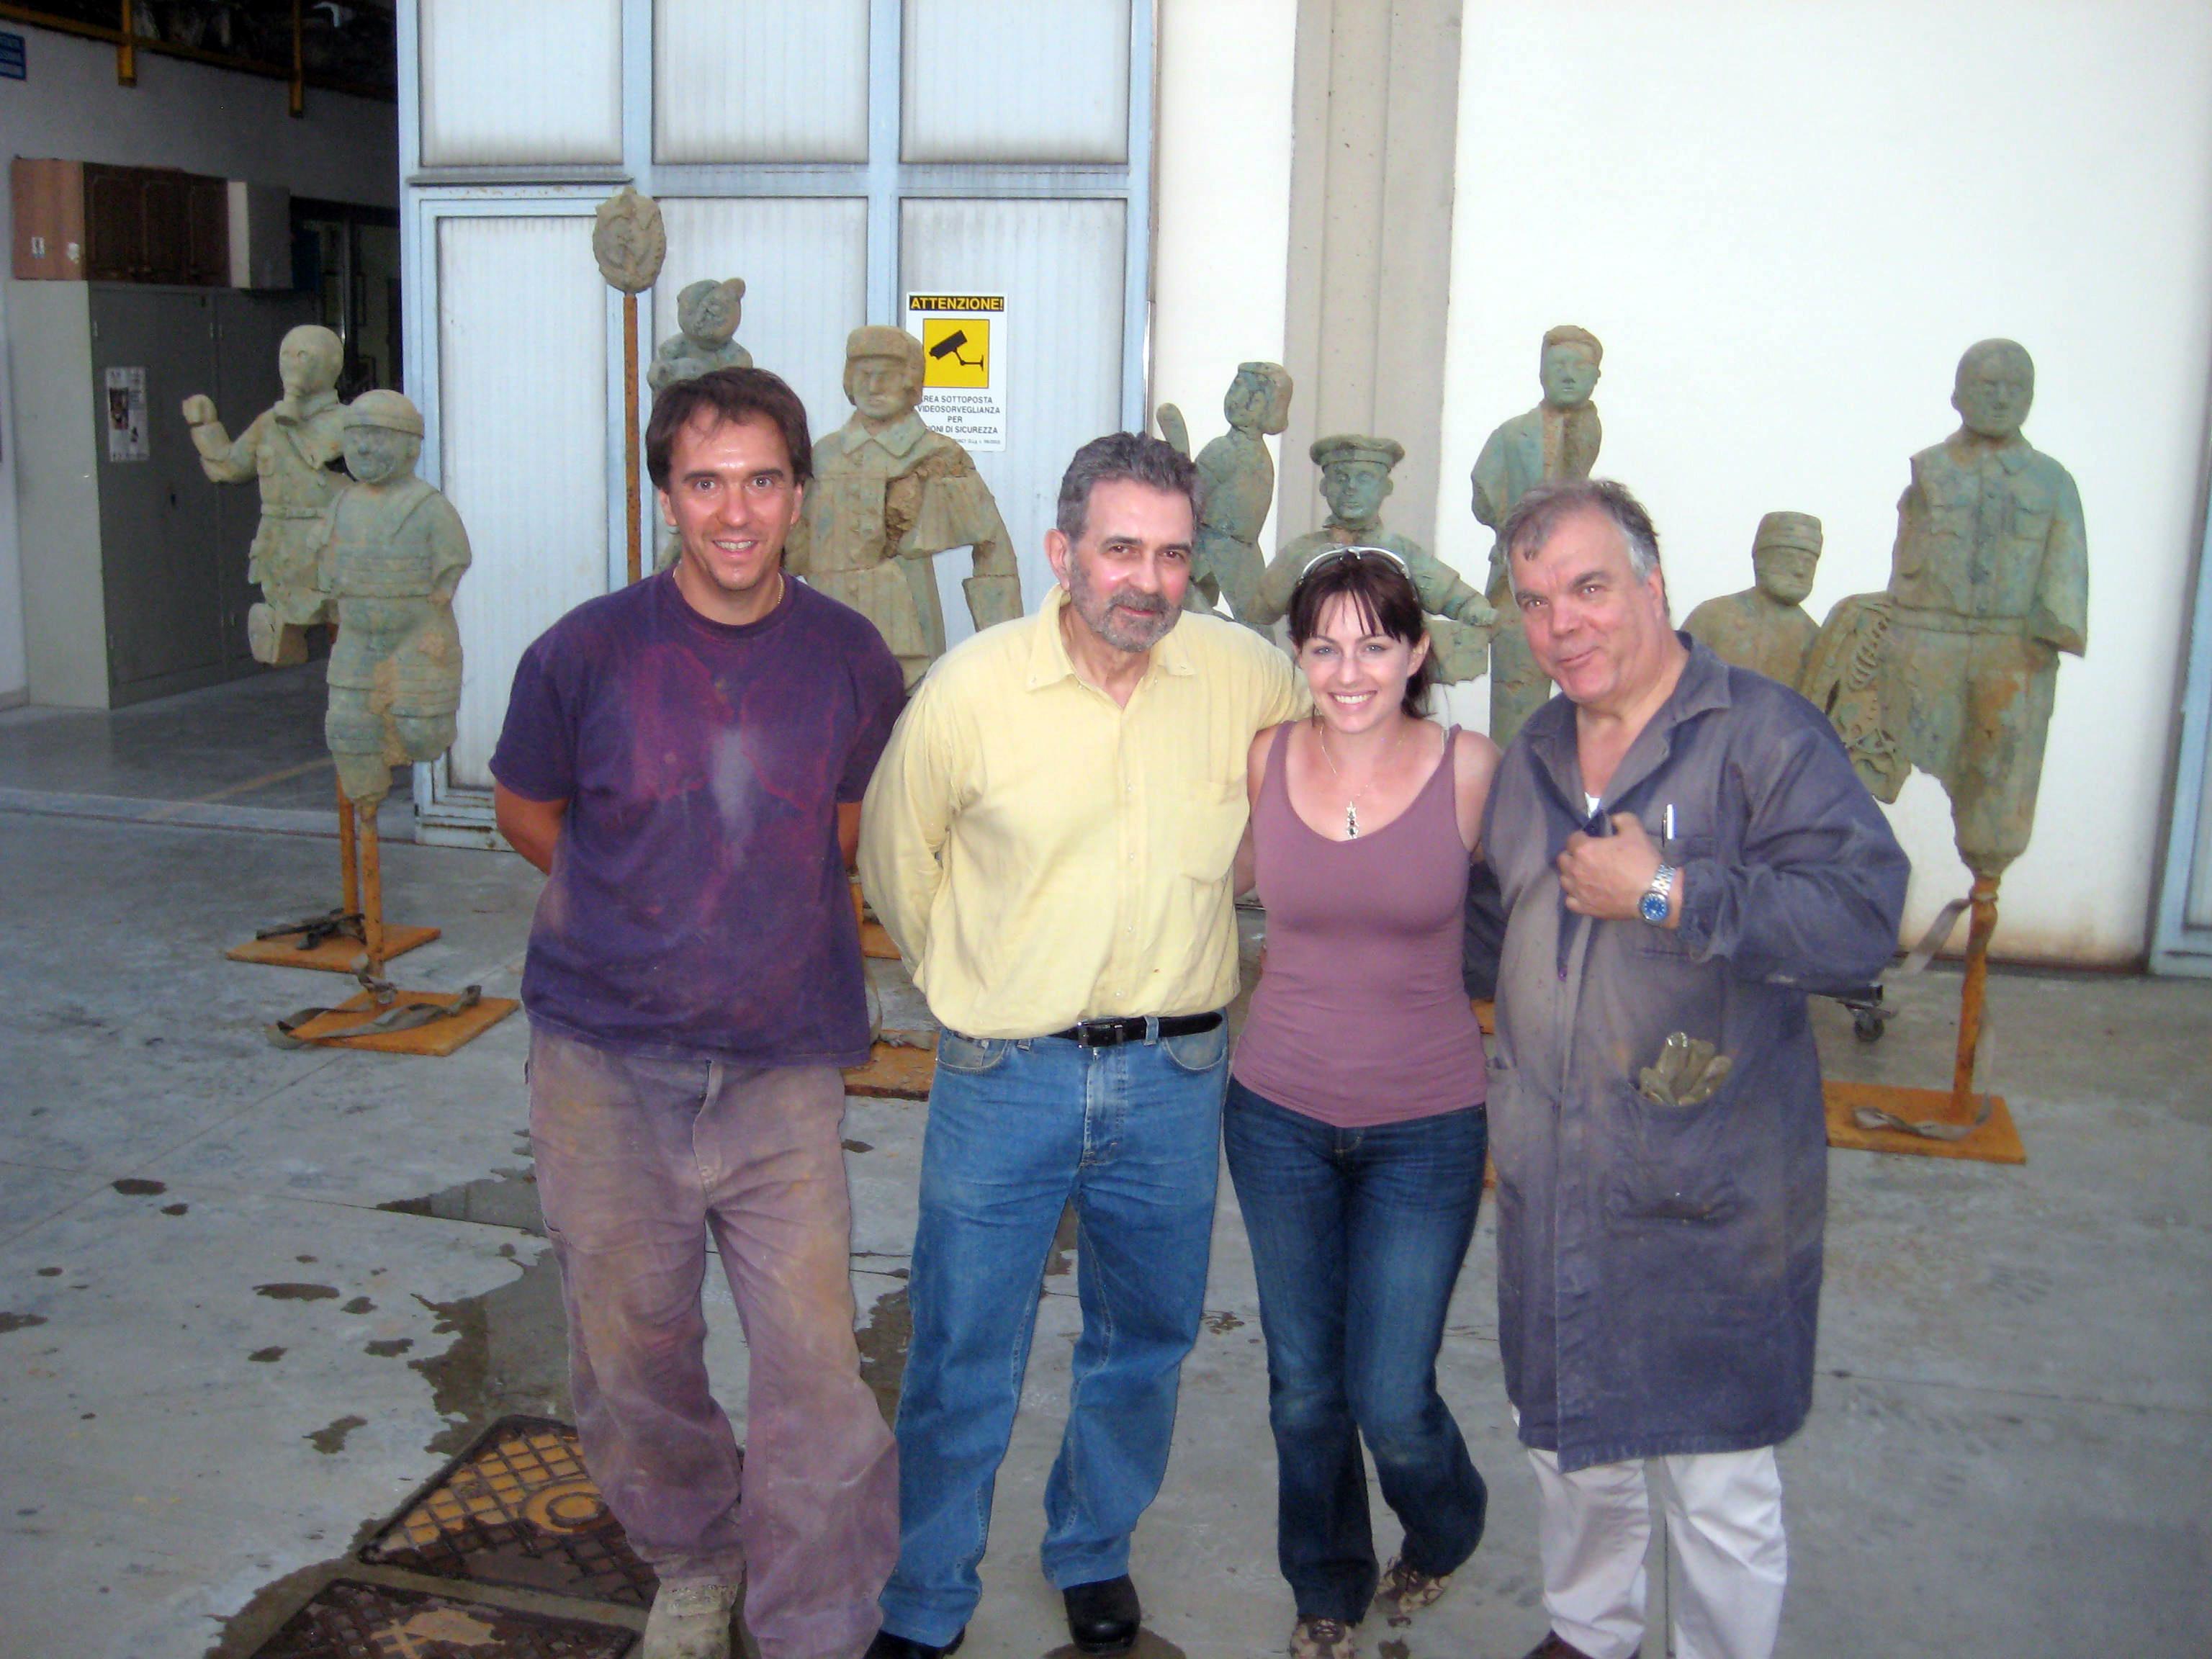 Grisha Bruskin con Giacomo ed  Enrico Salvadori  - Collezione dell'Archeologo